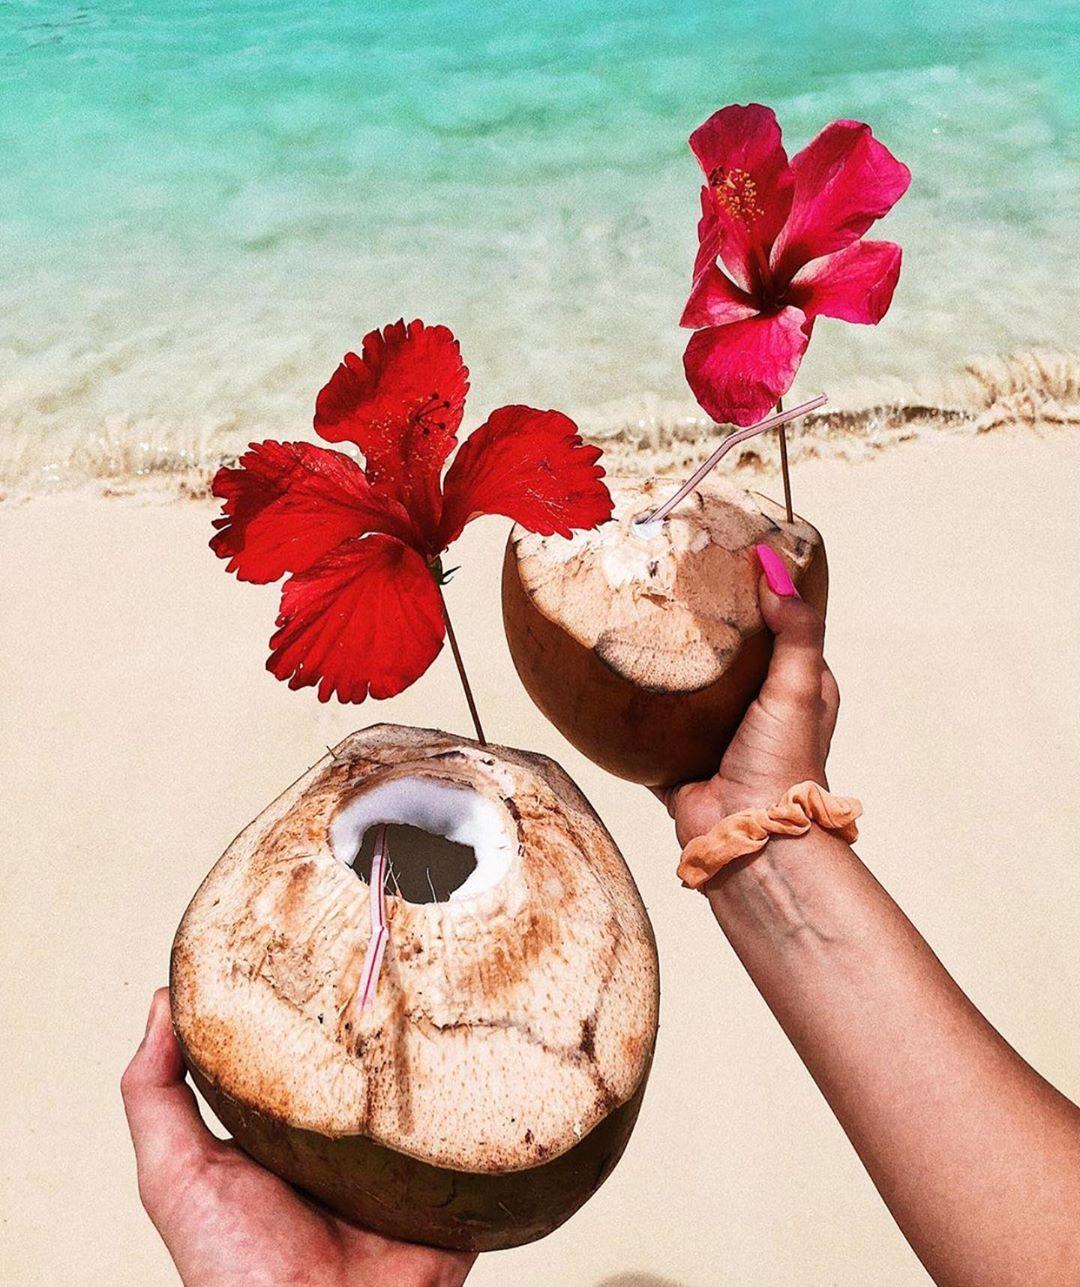 du lịch biển-uống dừa bên biển champange